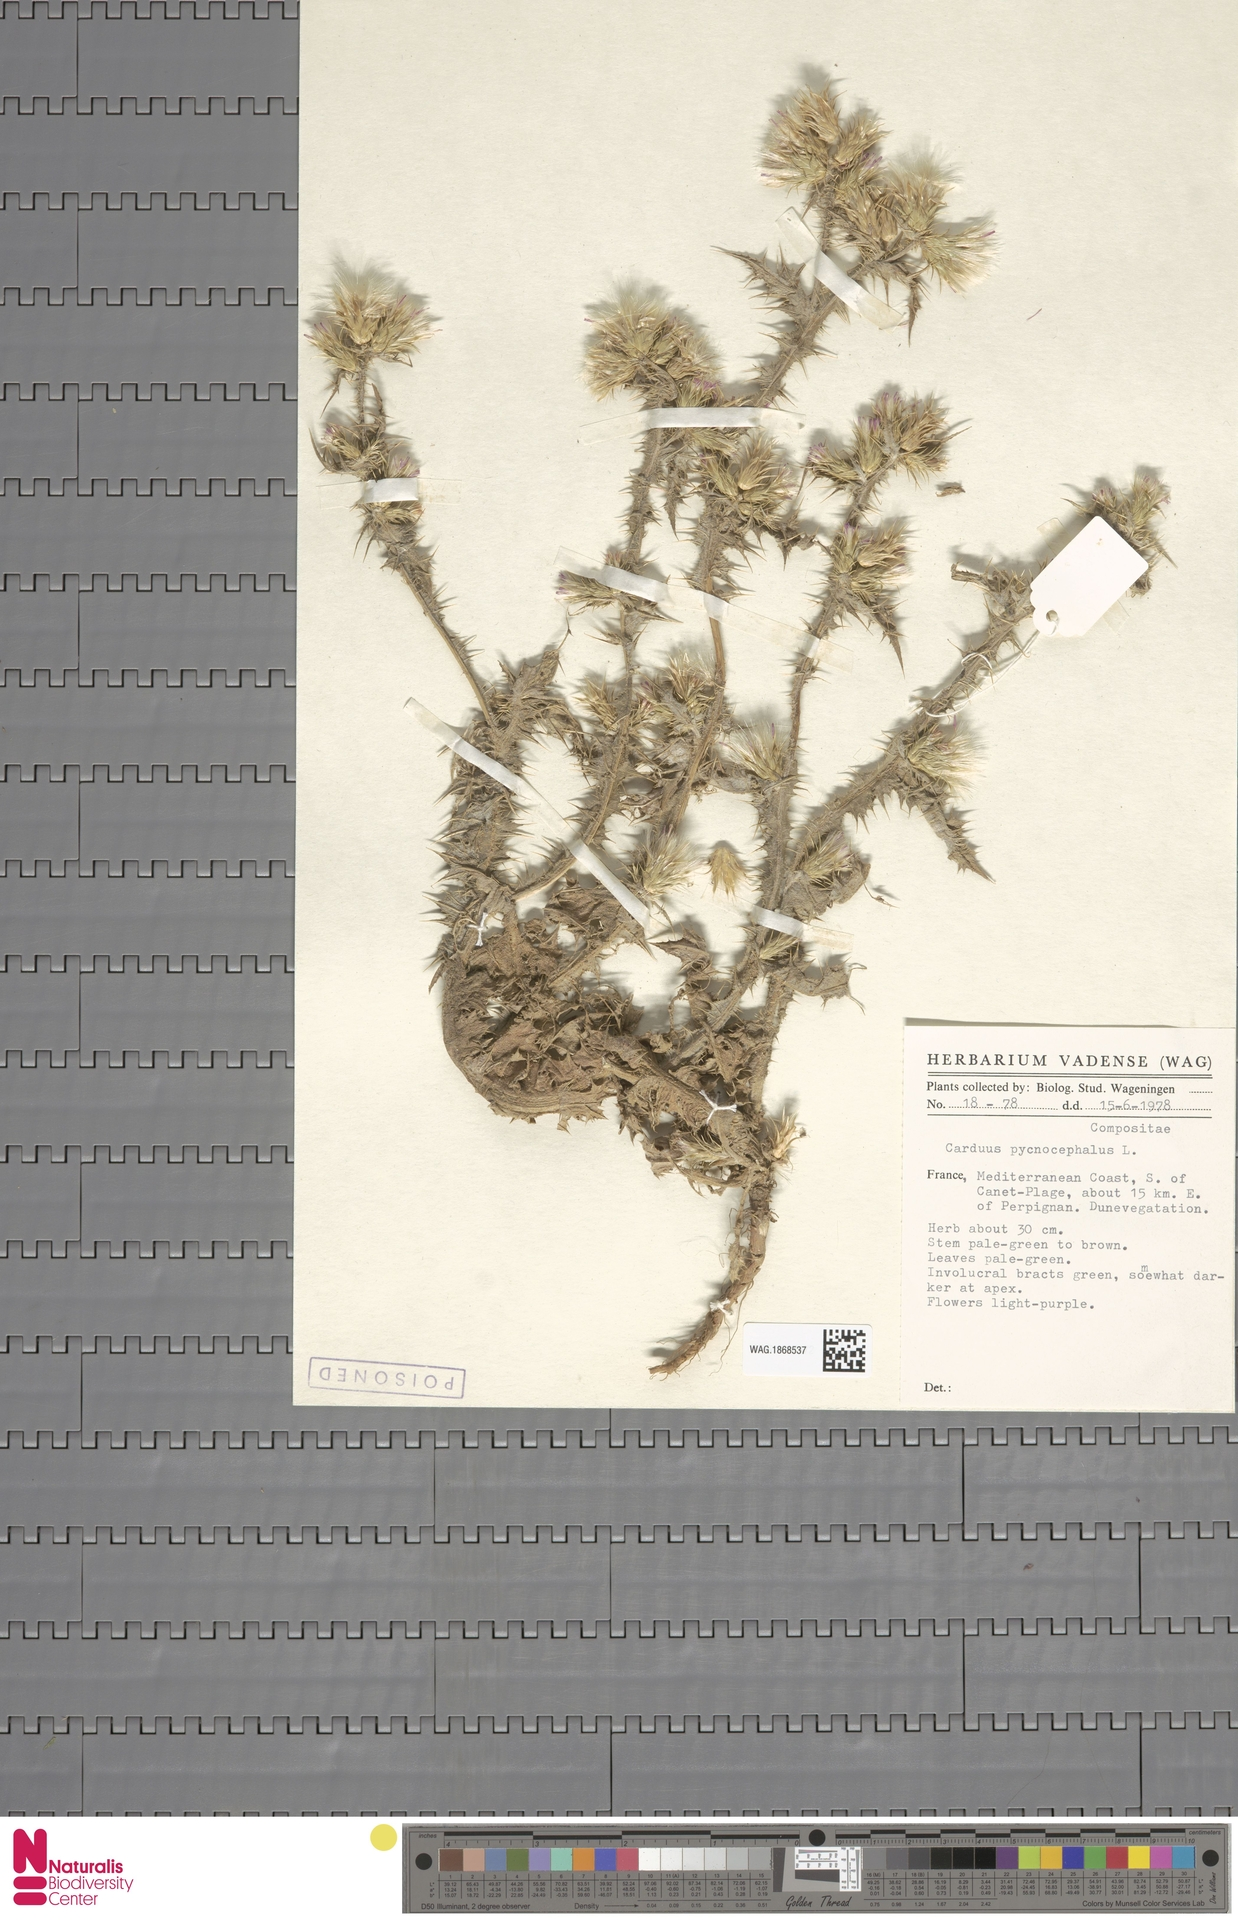 WAG.1868537 | Carduus pycnocephalus L.